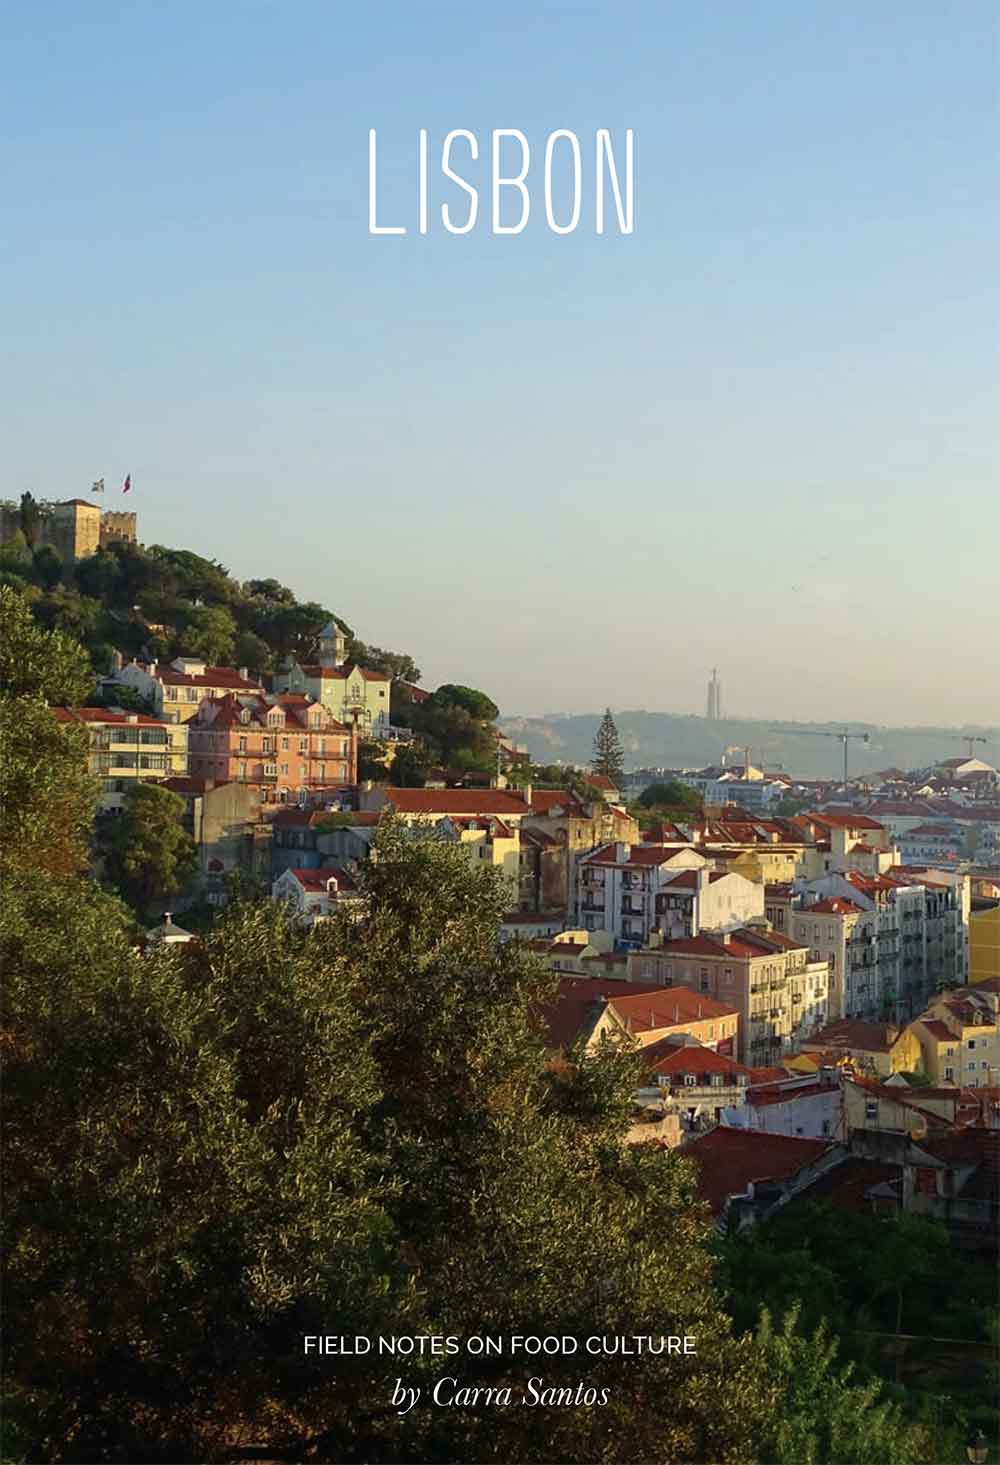 Carra Santos 'Field Notes on Food Culture - Lisbon' report